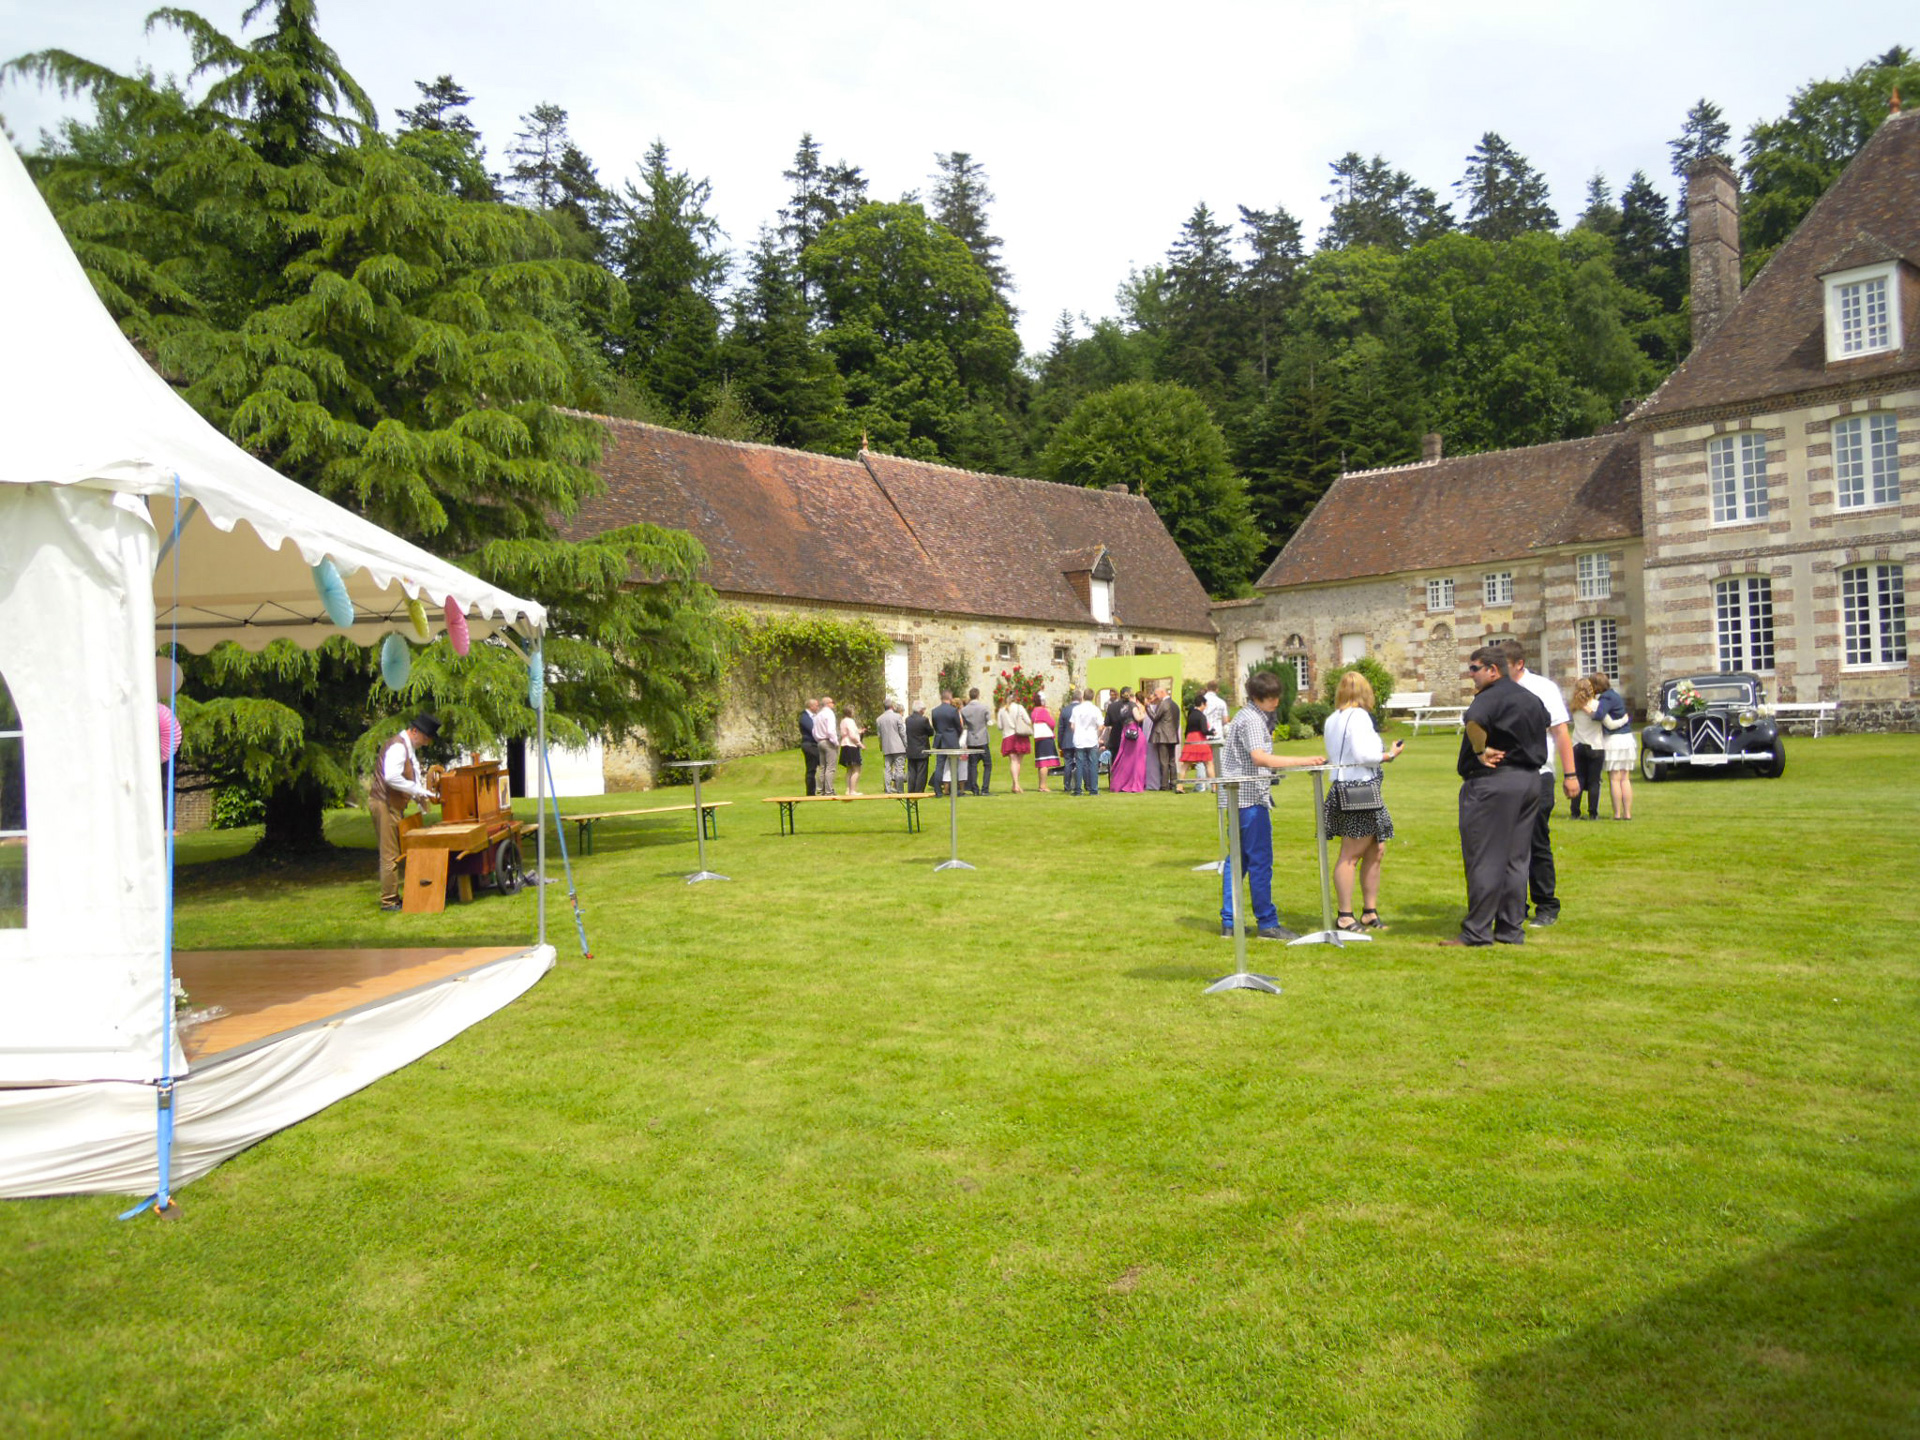 Petite tente de reception lors d'un mariage a Bellegarde